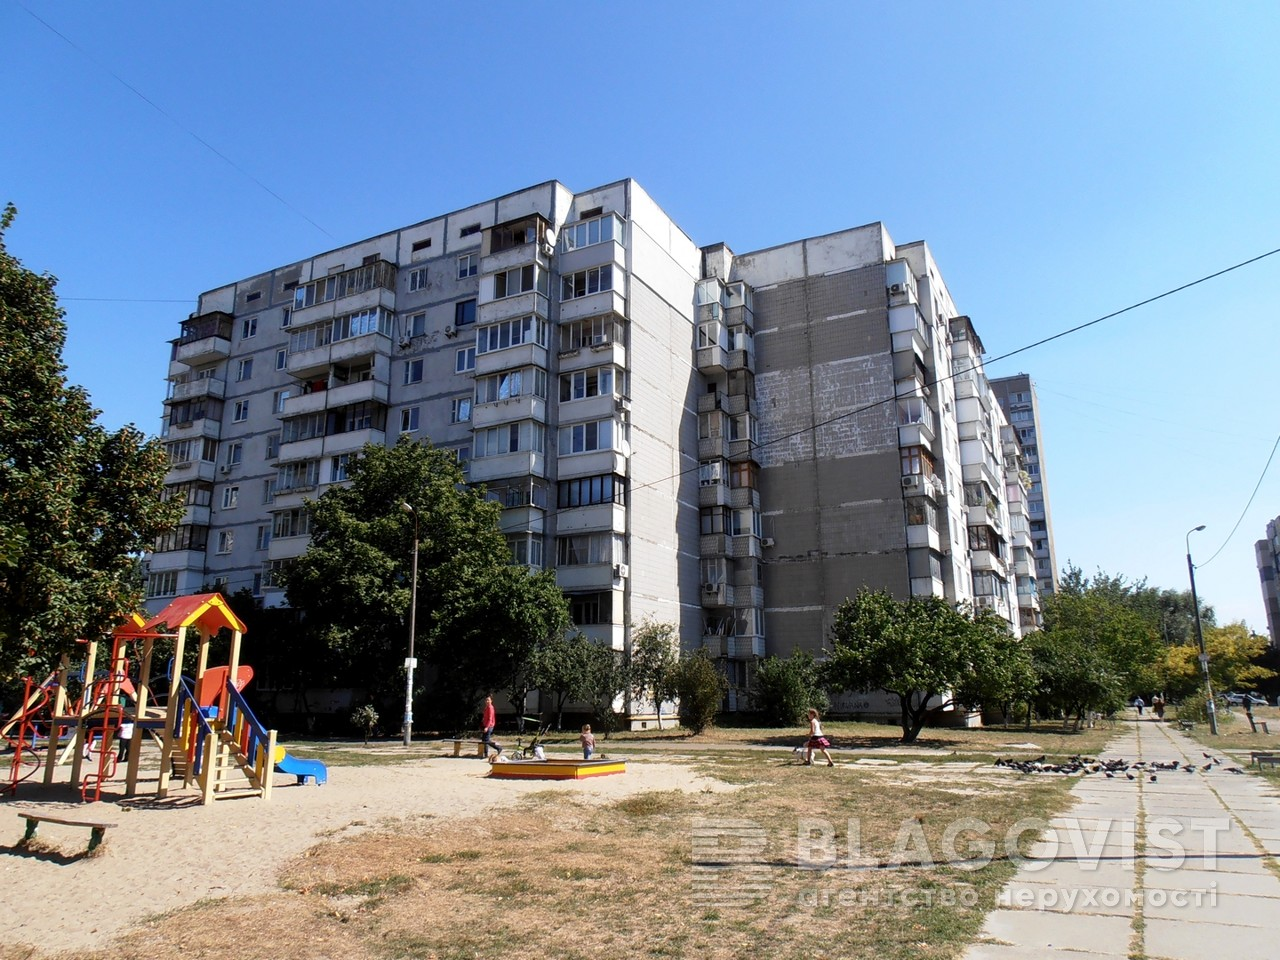 Квартира A-103835, Закревского Николая, 47б, Киев - Фото 1